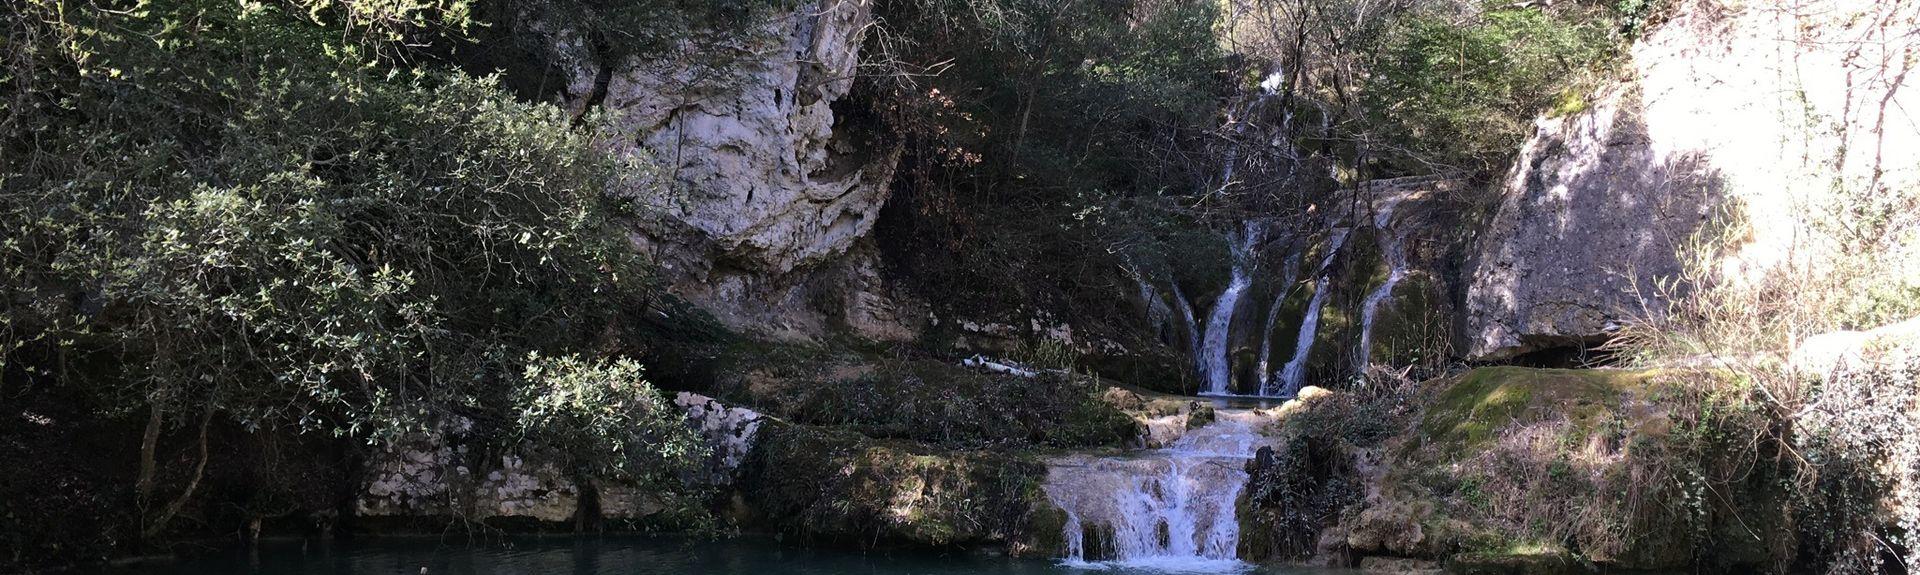 Villetritouls, Occitanie, Frankrig